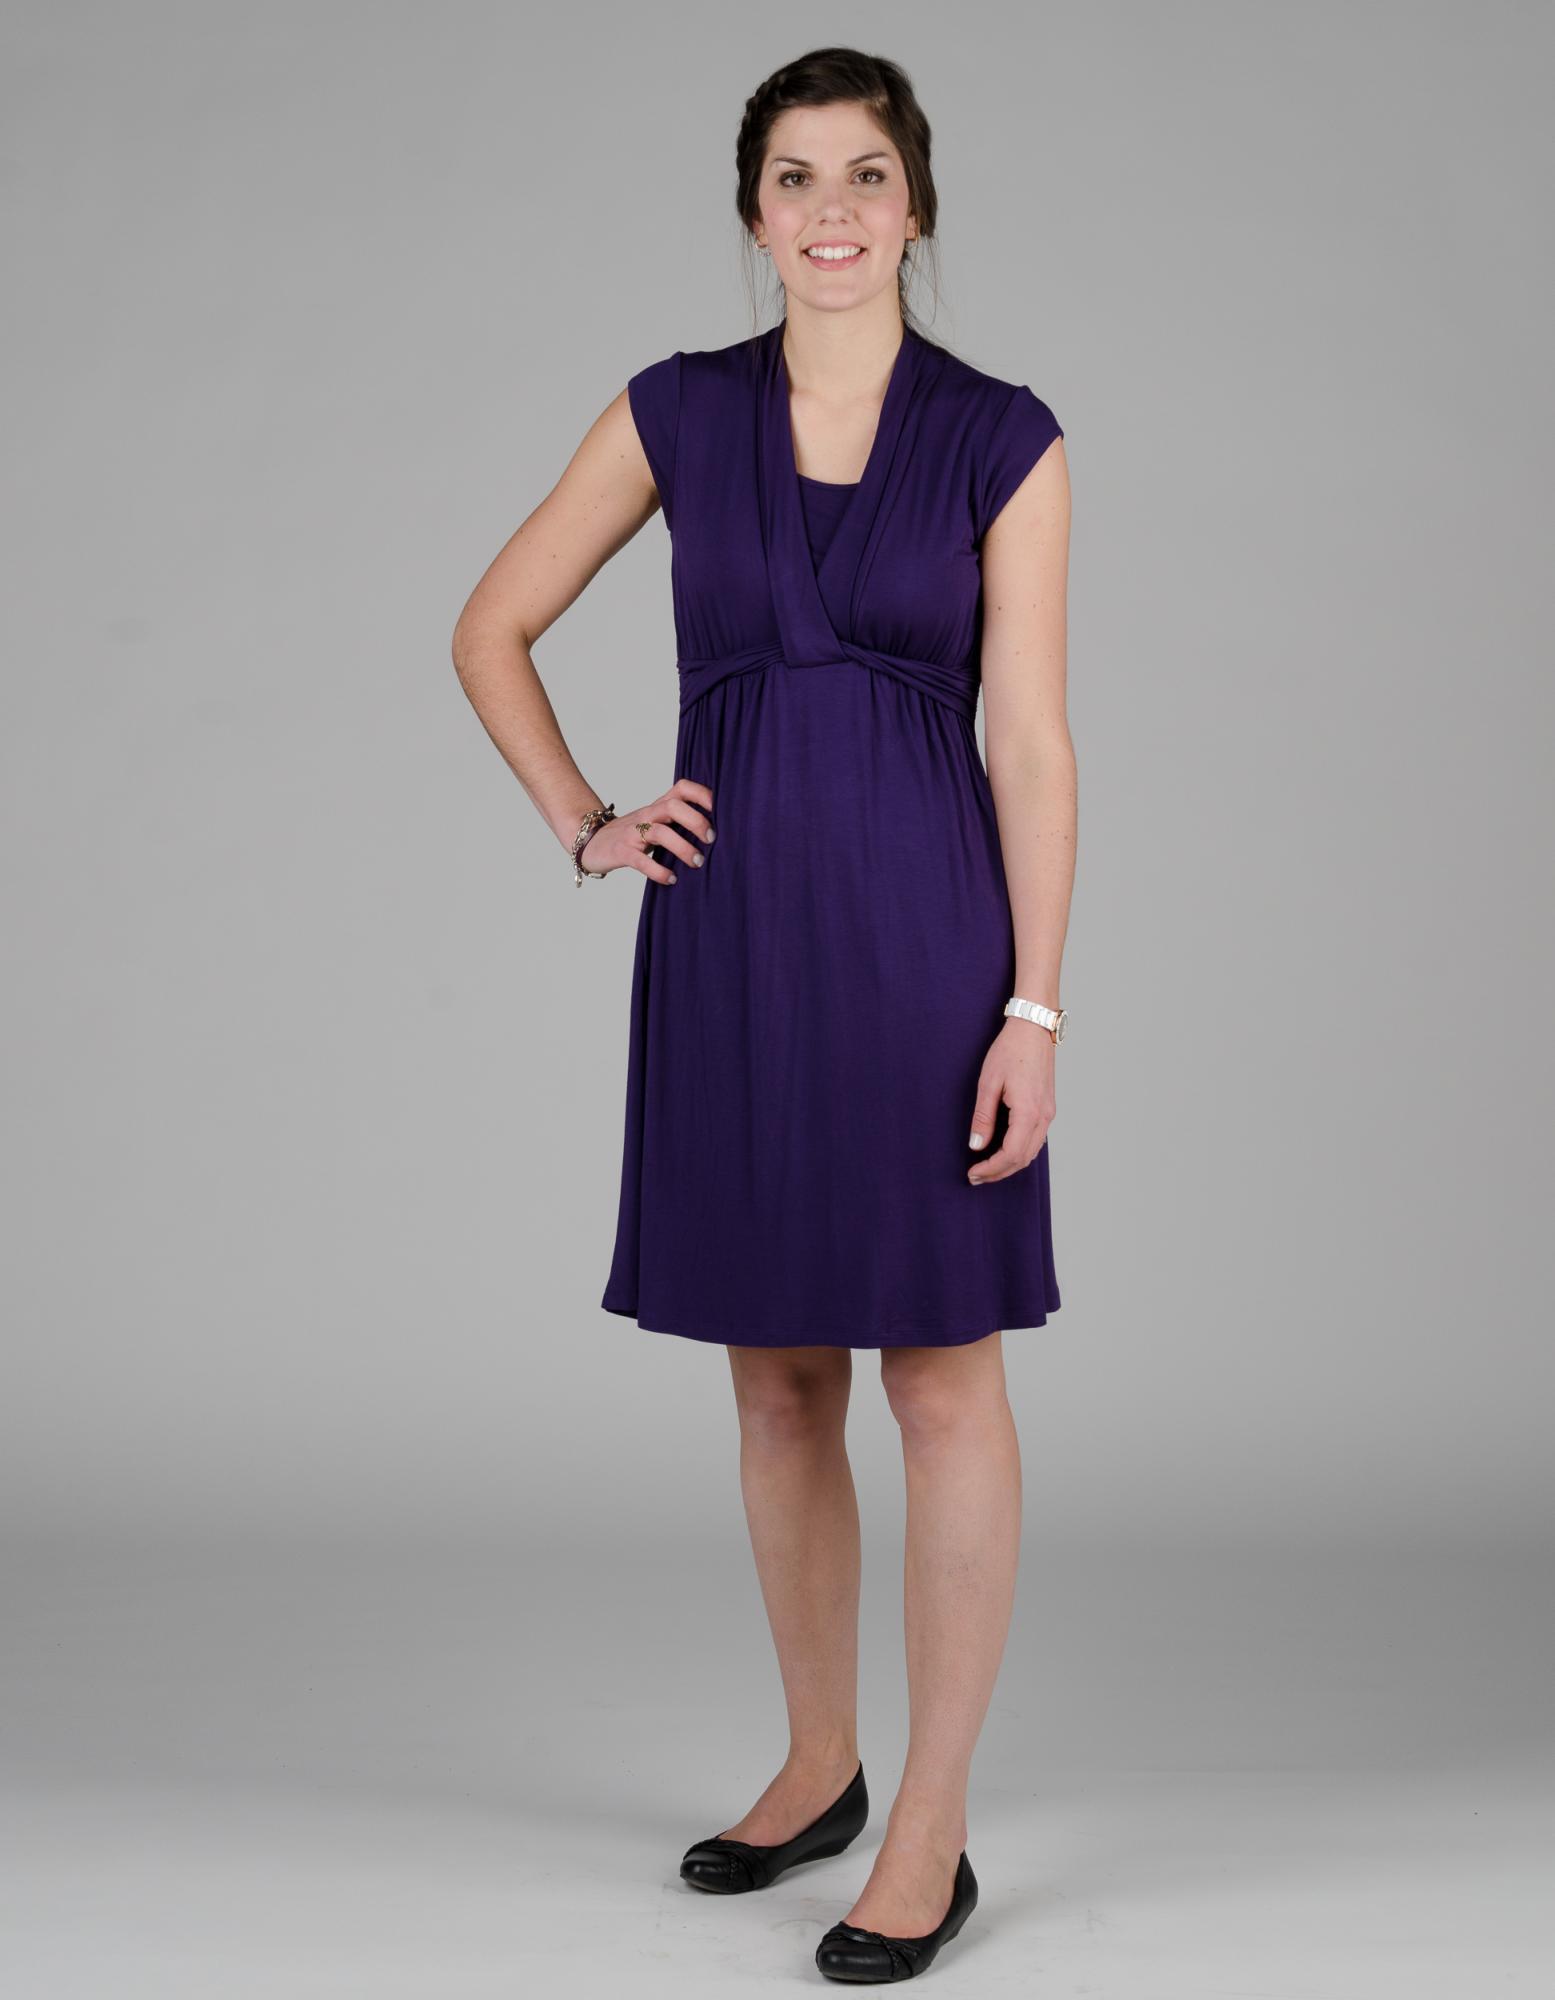 momzelle-suzy-nursing-dress-purple.jpg